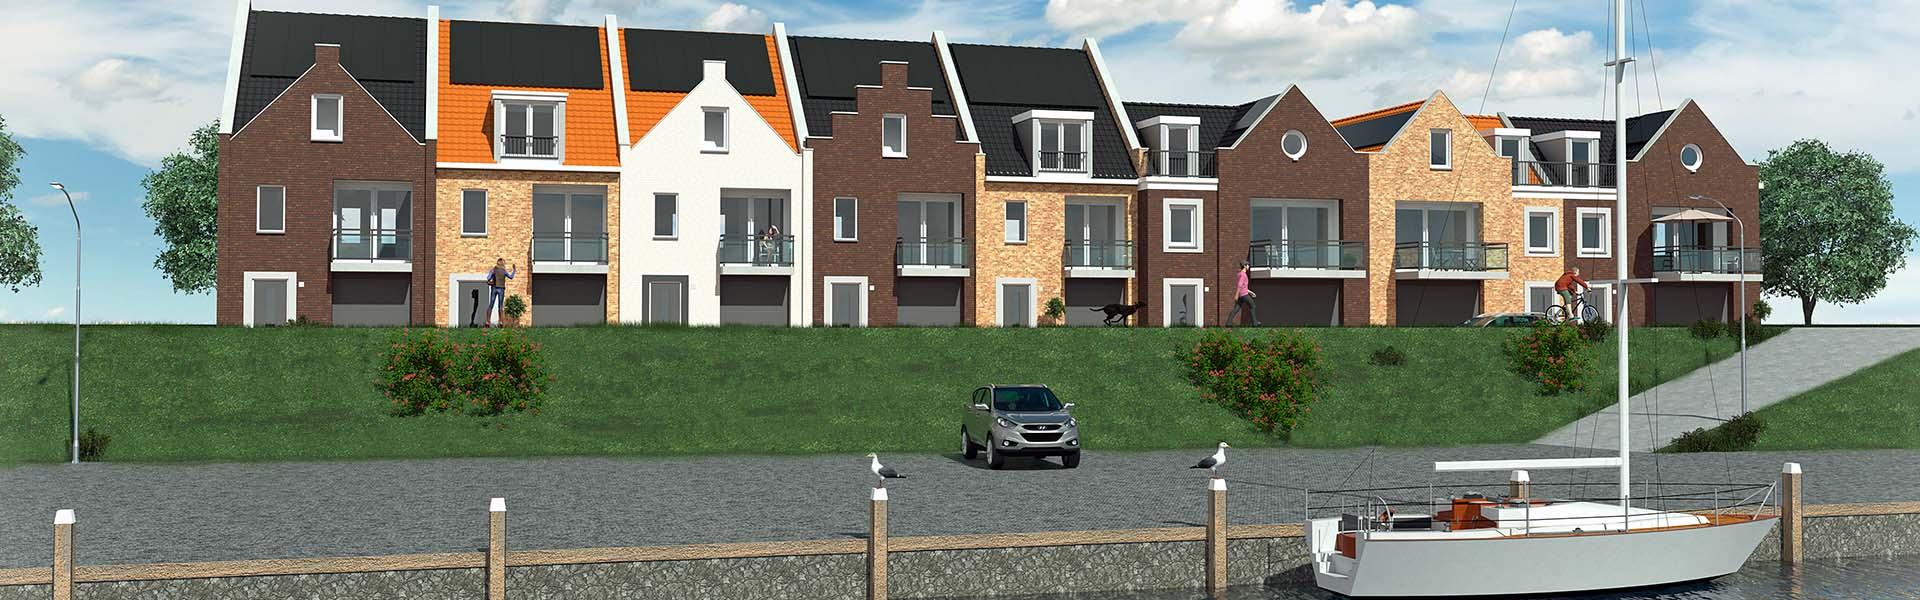 Nieuwbouwproject Sint Philipsland Pakuus